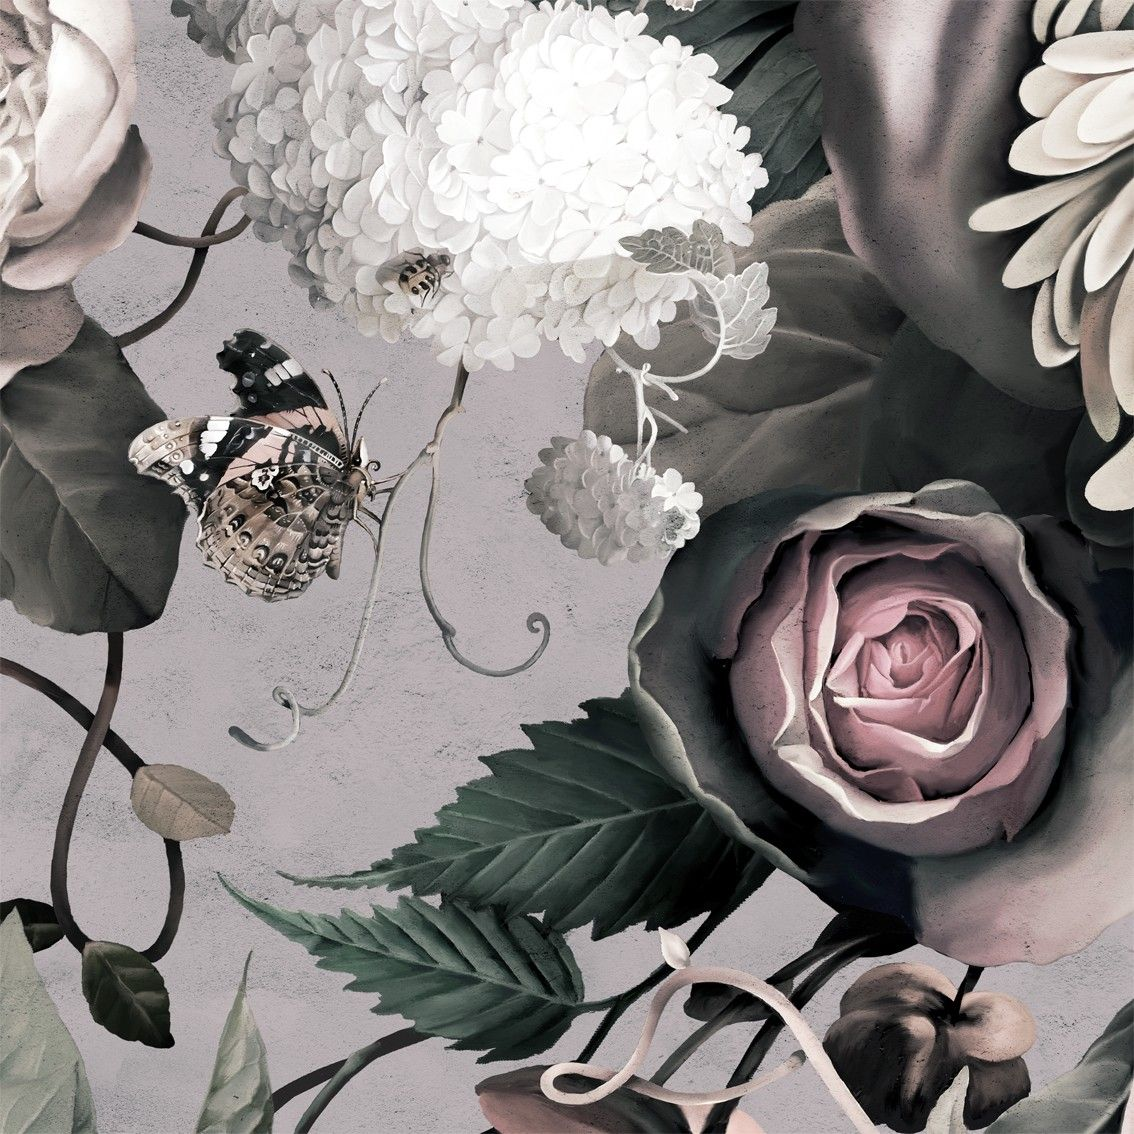 Black floral print wallpaper dark floral wallpaper by ellie cashman - Dark Floral Ii Gray Fresco Sample Floral Wallpaper Samples By Ellie Cashman Design